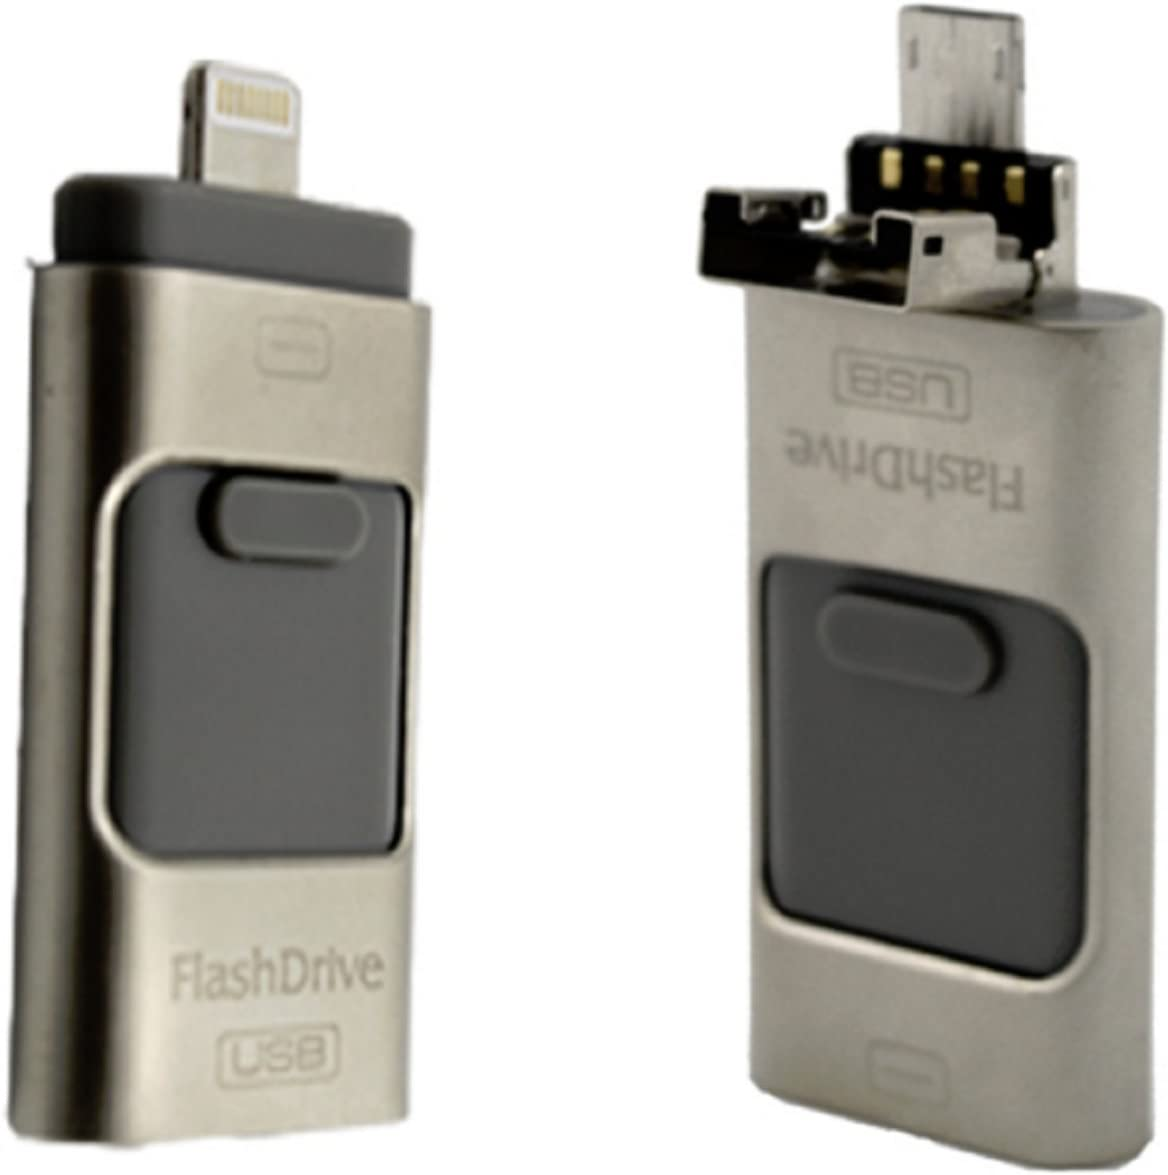 Newest i-Flash iFlash Drive HD U-Disk Micro USB Interface 3 in 1 for Android/iPhone 5/6/5s/6Plus iPad iPod/PC/MAC 8/16/32/64GB (Silver 32 GB)